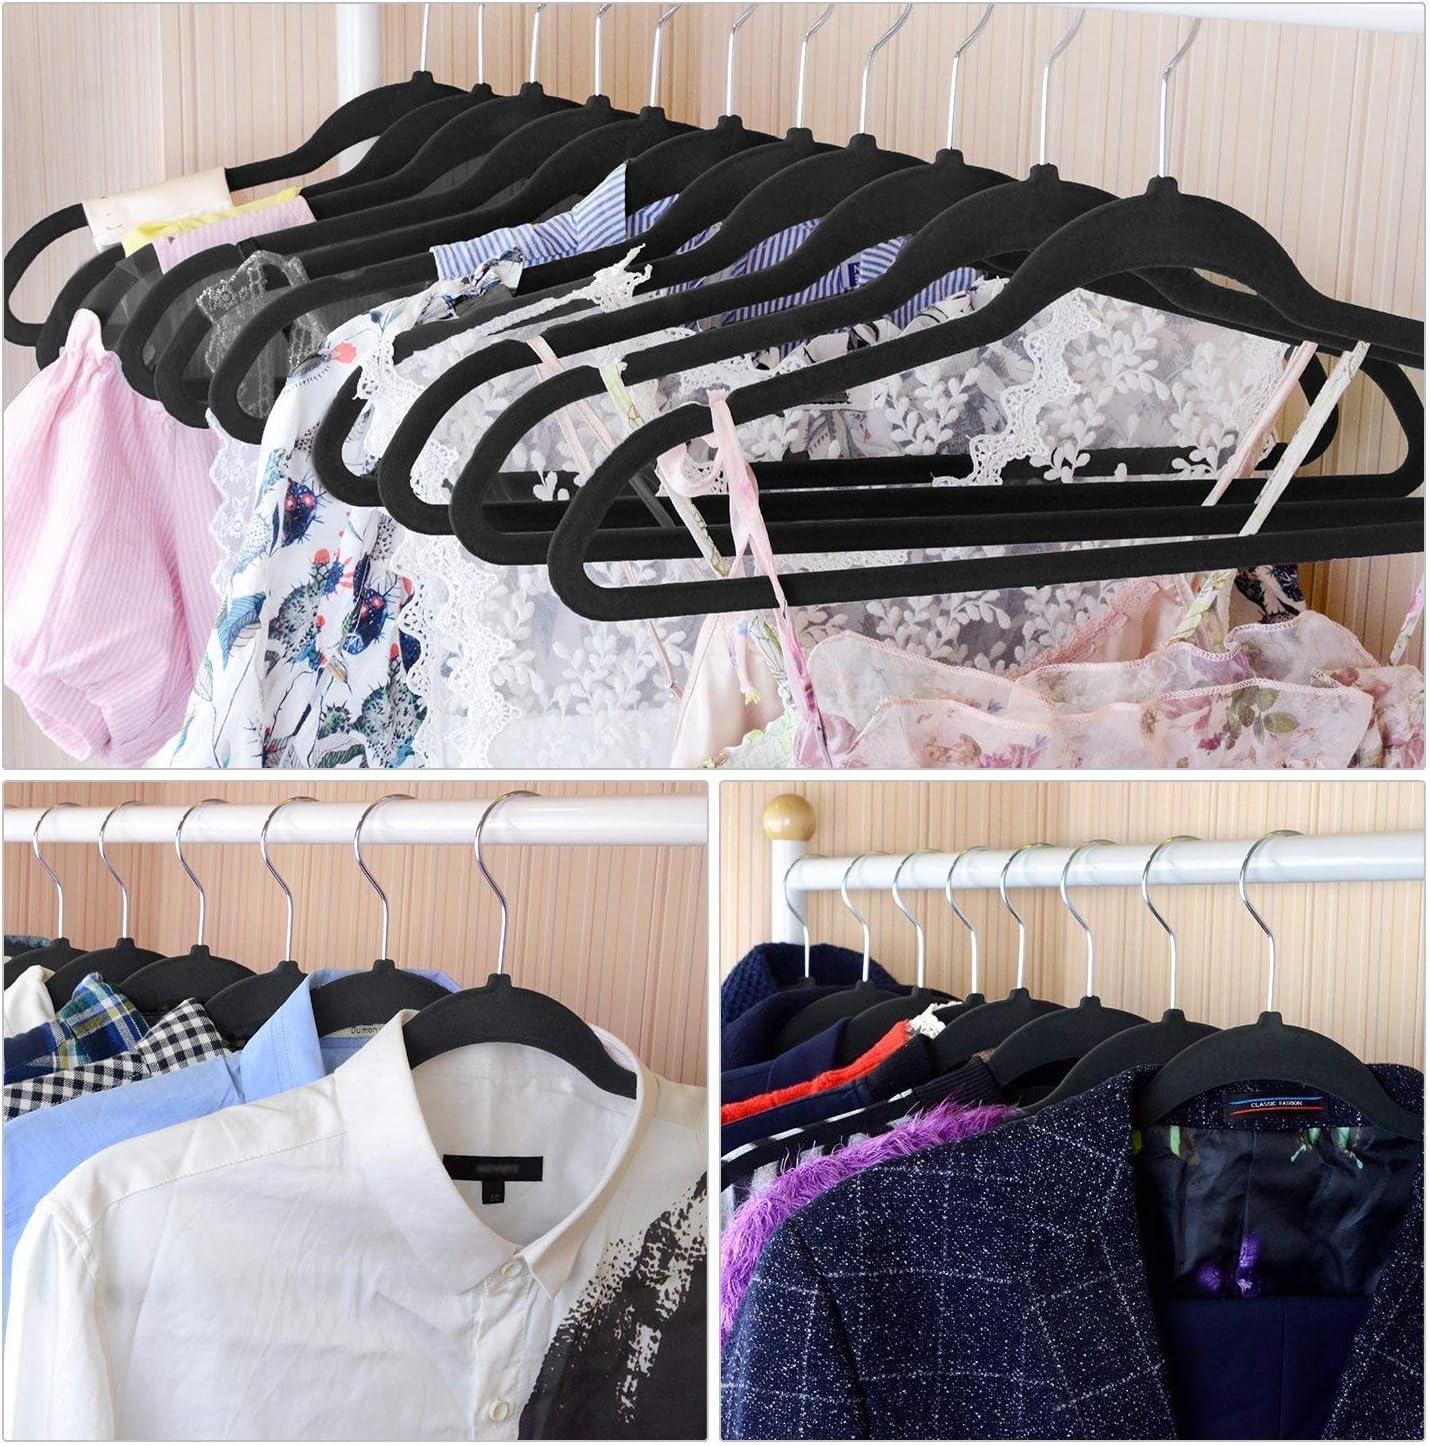 Black /… 30 Pack Nonslip Clothes Hangers Heavy Duty 360 Swivel Hanger Hook Ultra Thin Clothes Racks Perfect for Space Saving IEOKE Velvet Hangers